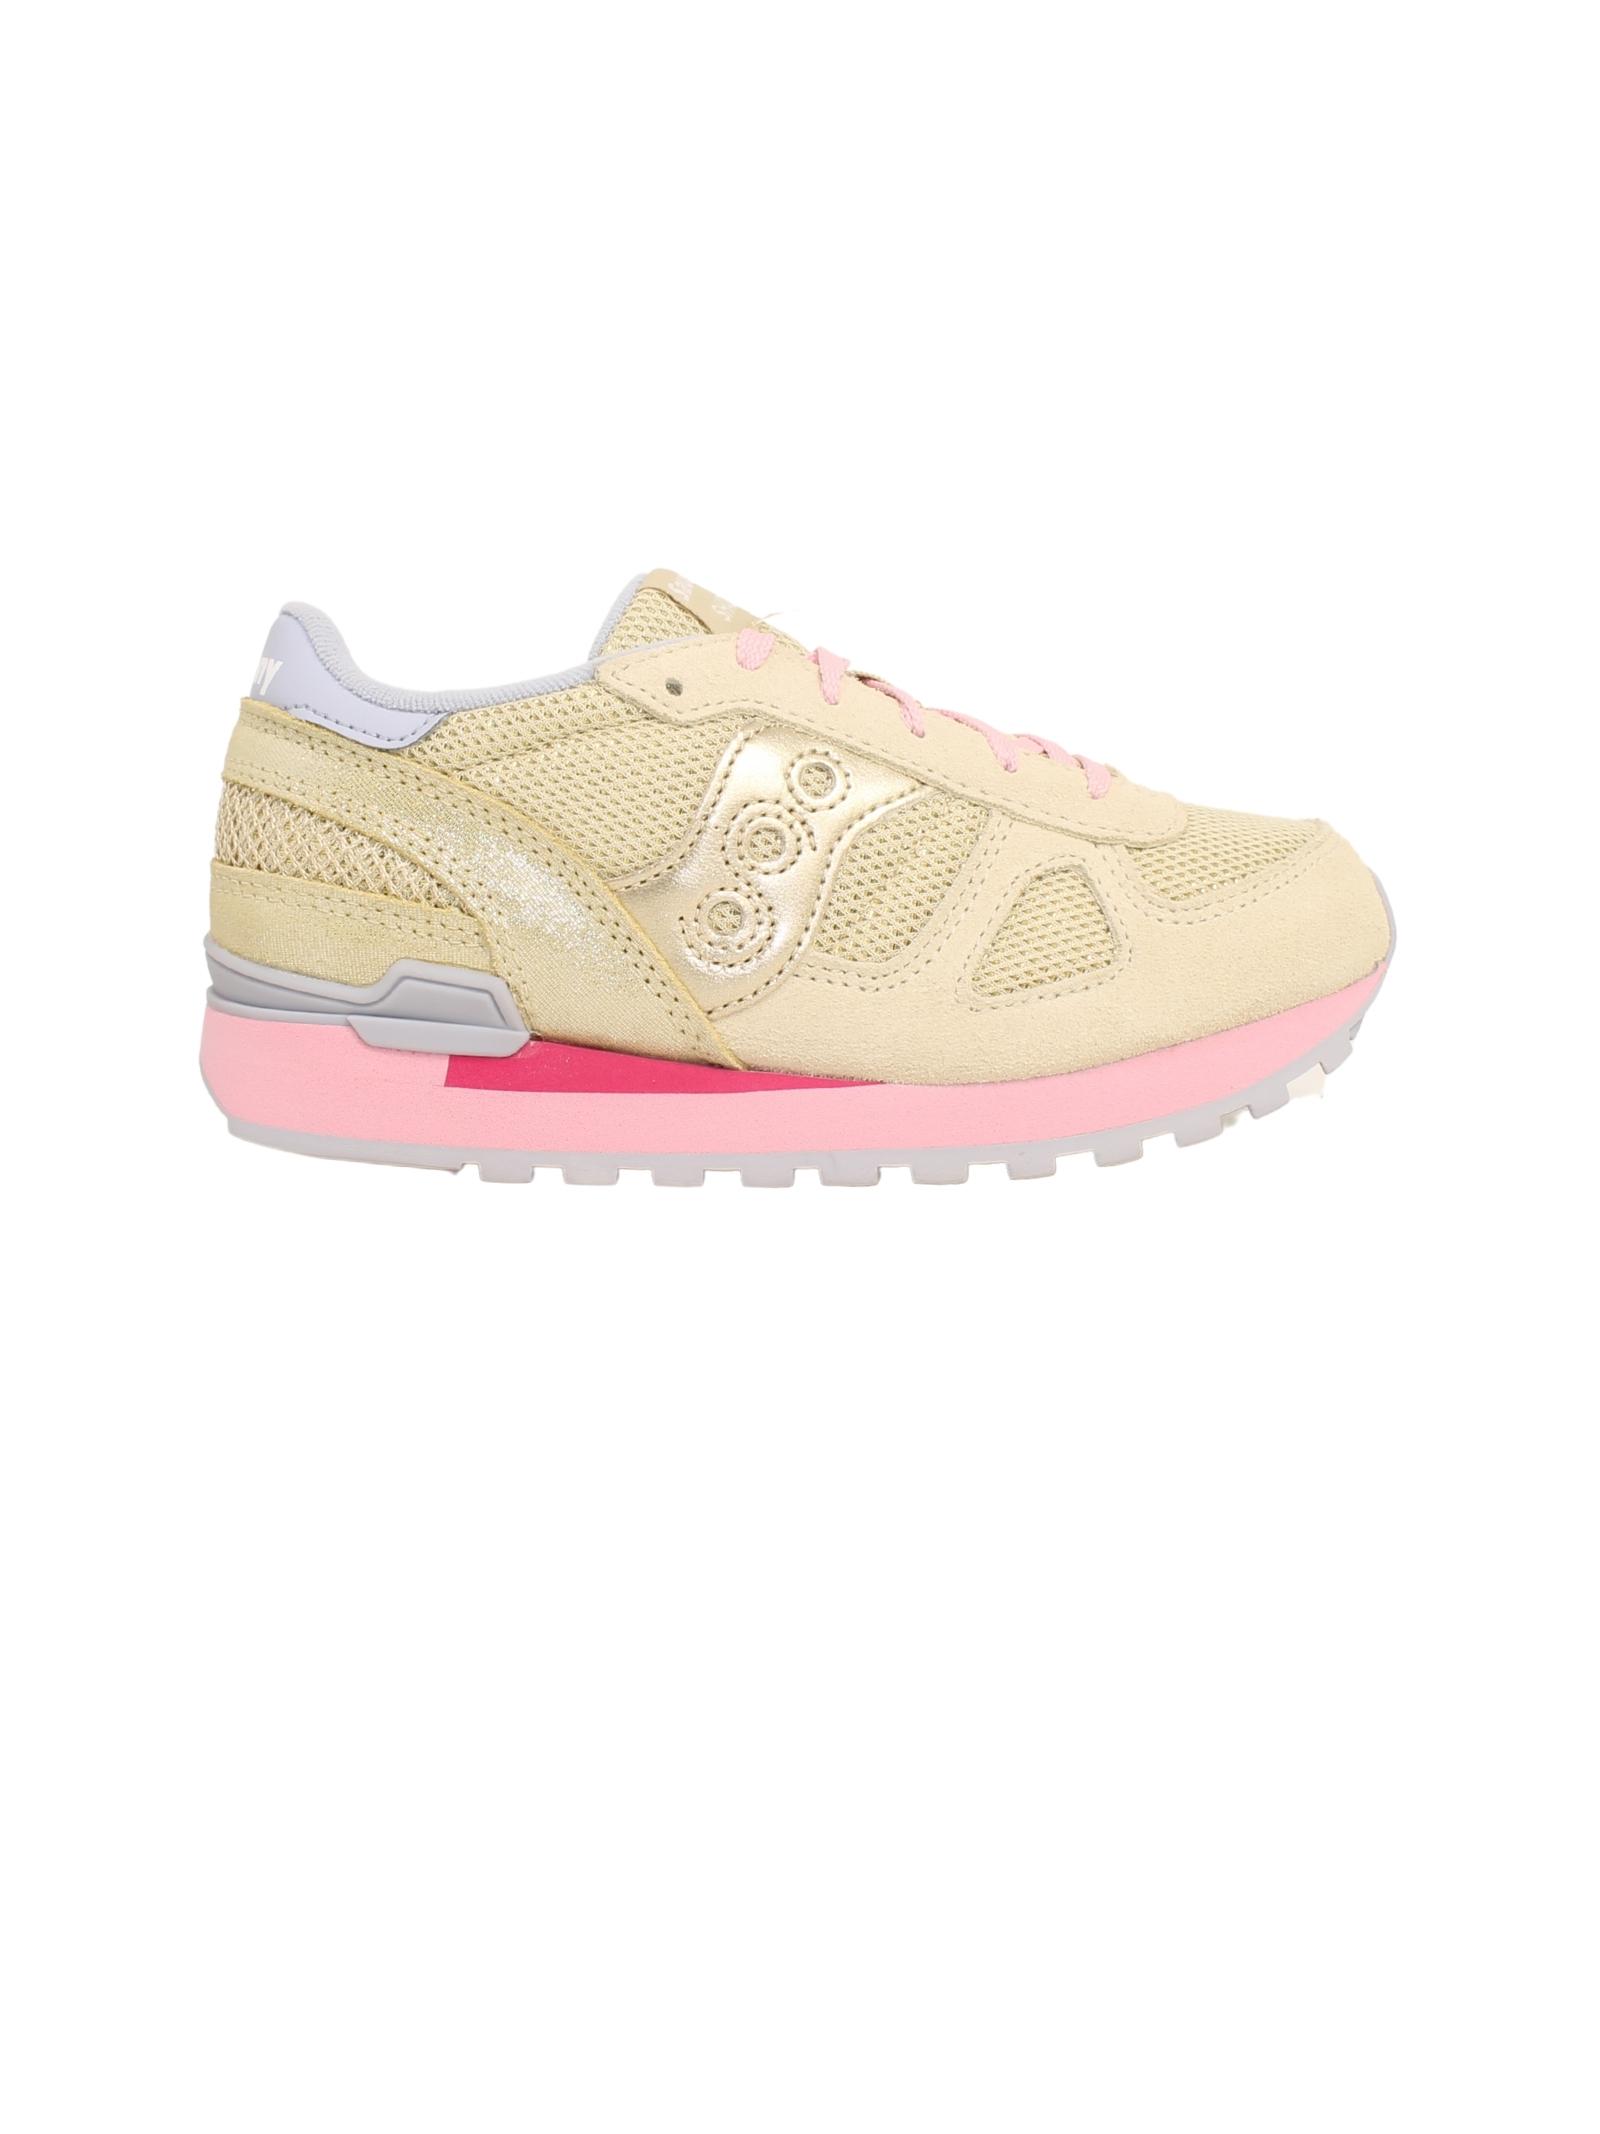 Sneakers Shadow Bambina SAUCONY KIDS | Sneakers | SK165171CREAM/MULTI